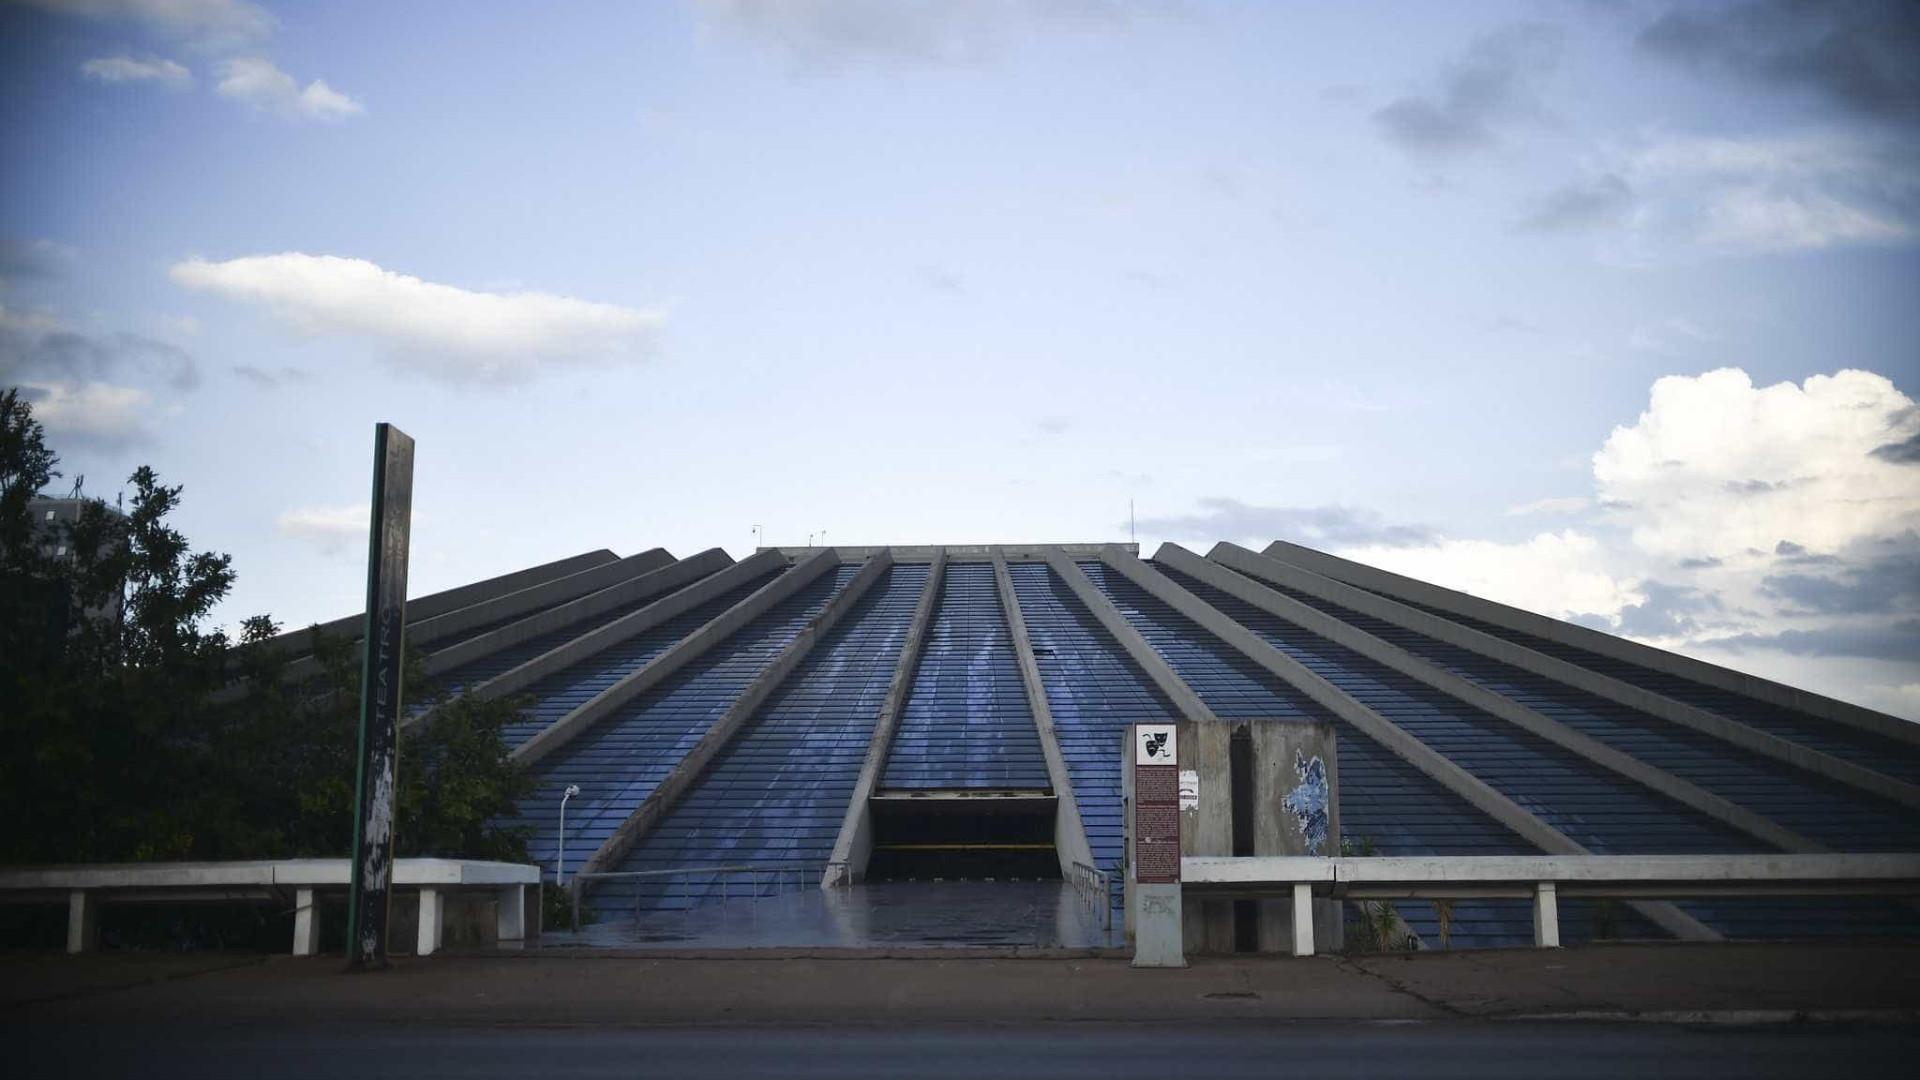 Ícone de Brasília, Teatro Nacional está fechado há 4 anos